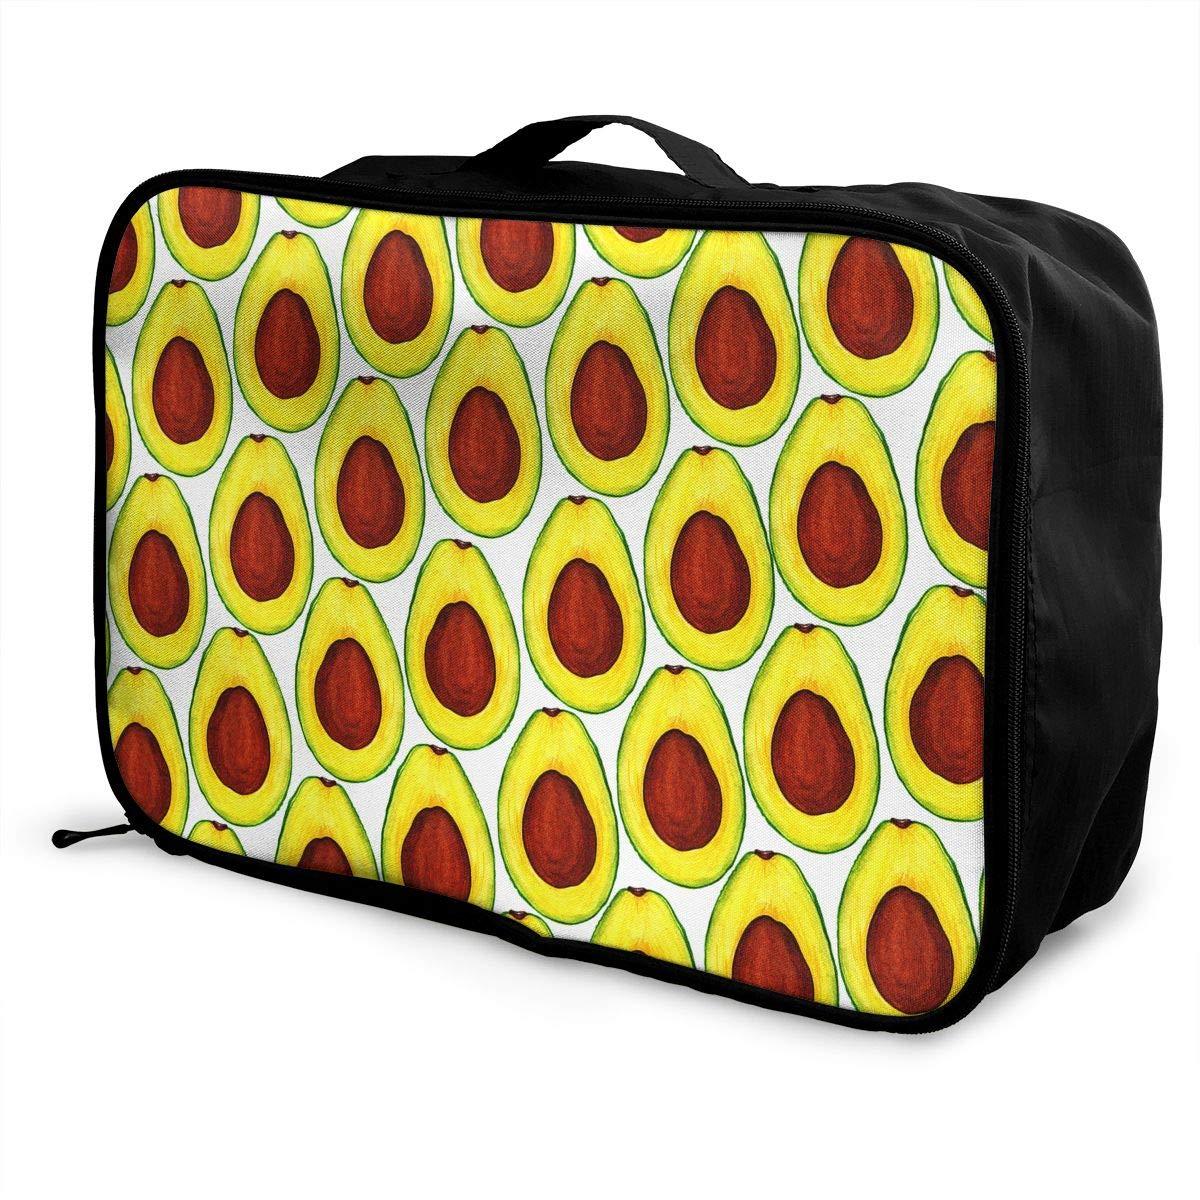 Travel Luggage Duffle Bag Lightweight Portable Handbag Avocados Yellow Pattern Large Capacity Waterproof Foldable Storage Tote